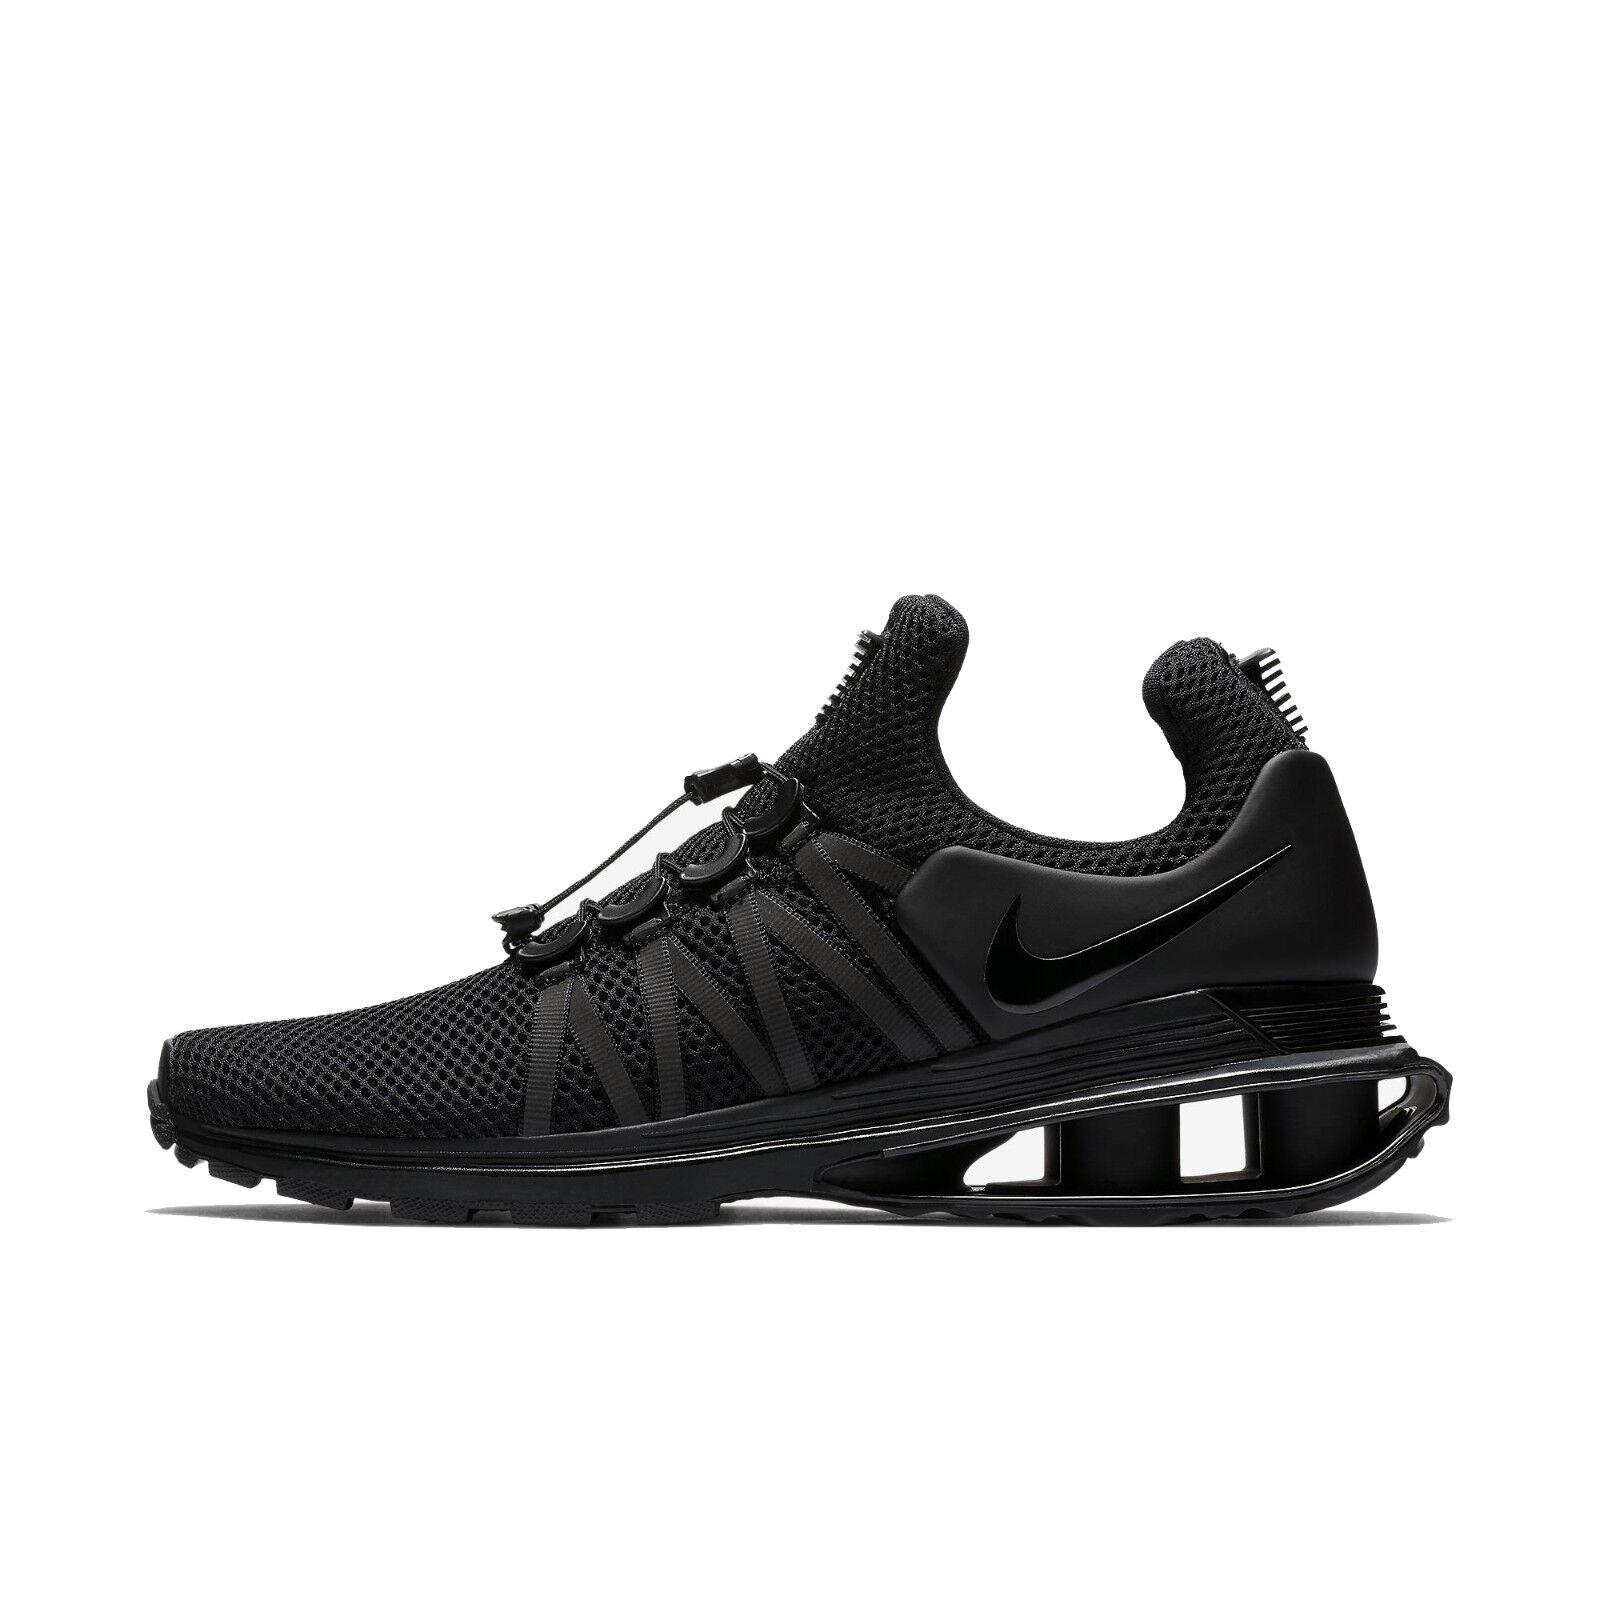 Nike Shox Gravity Low NZ Turbo Basketball Sneakers Men's shoes Black AR1999-001